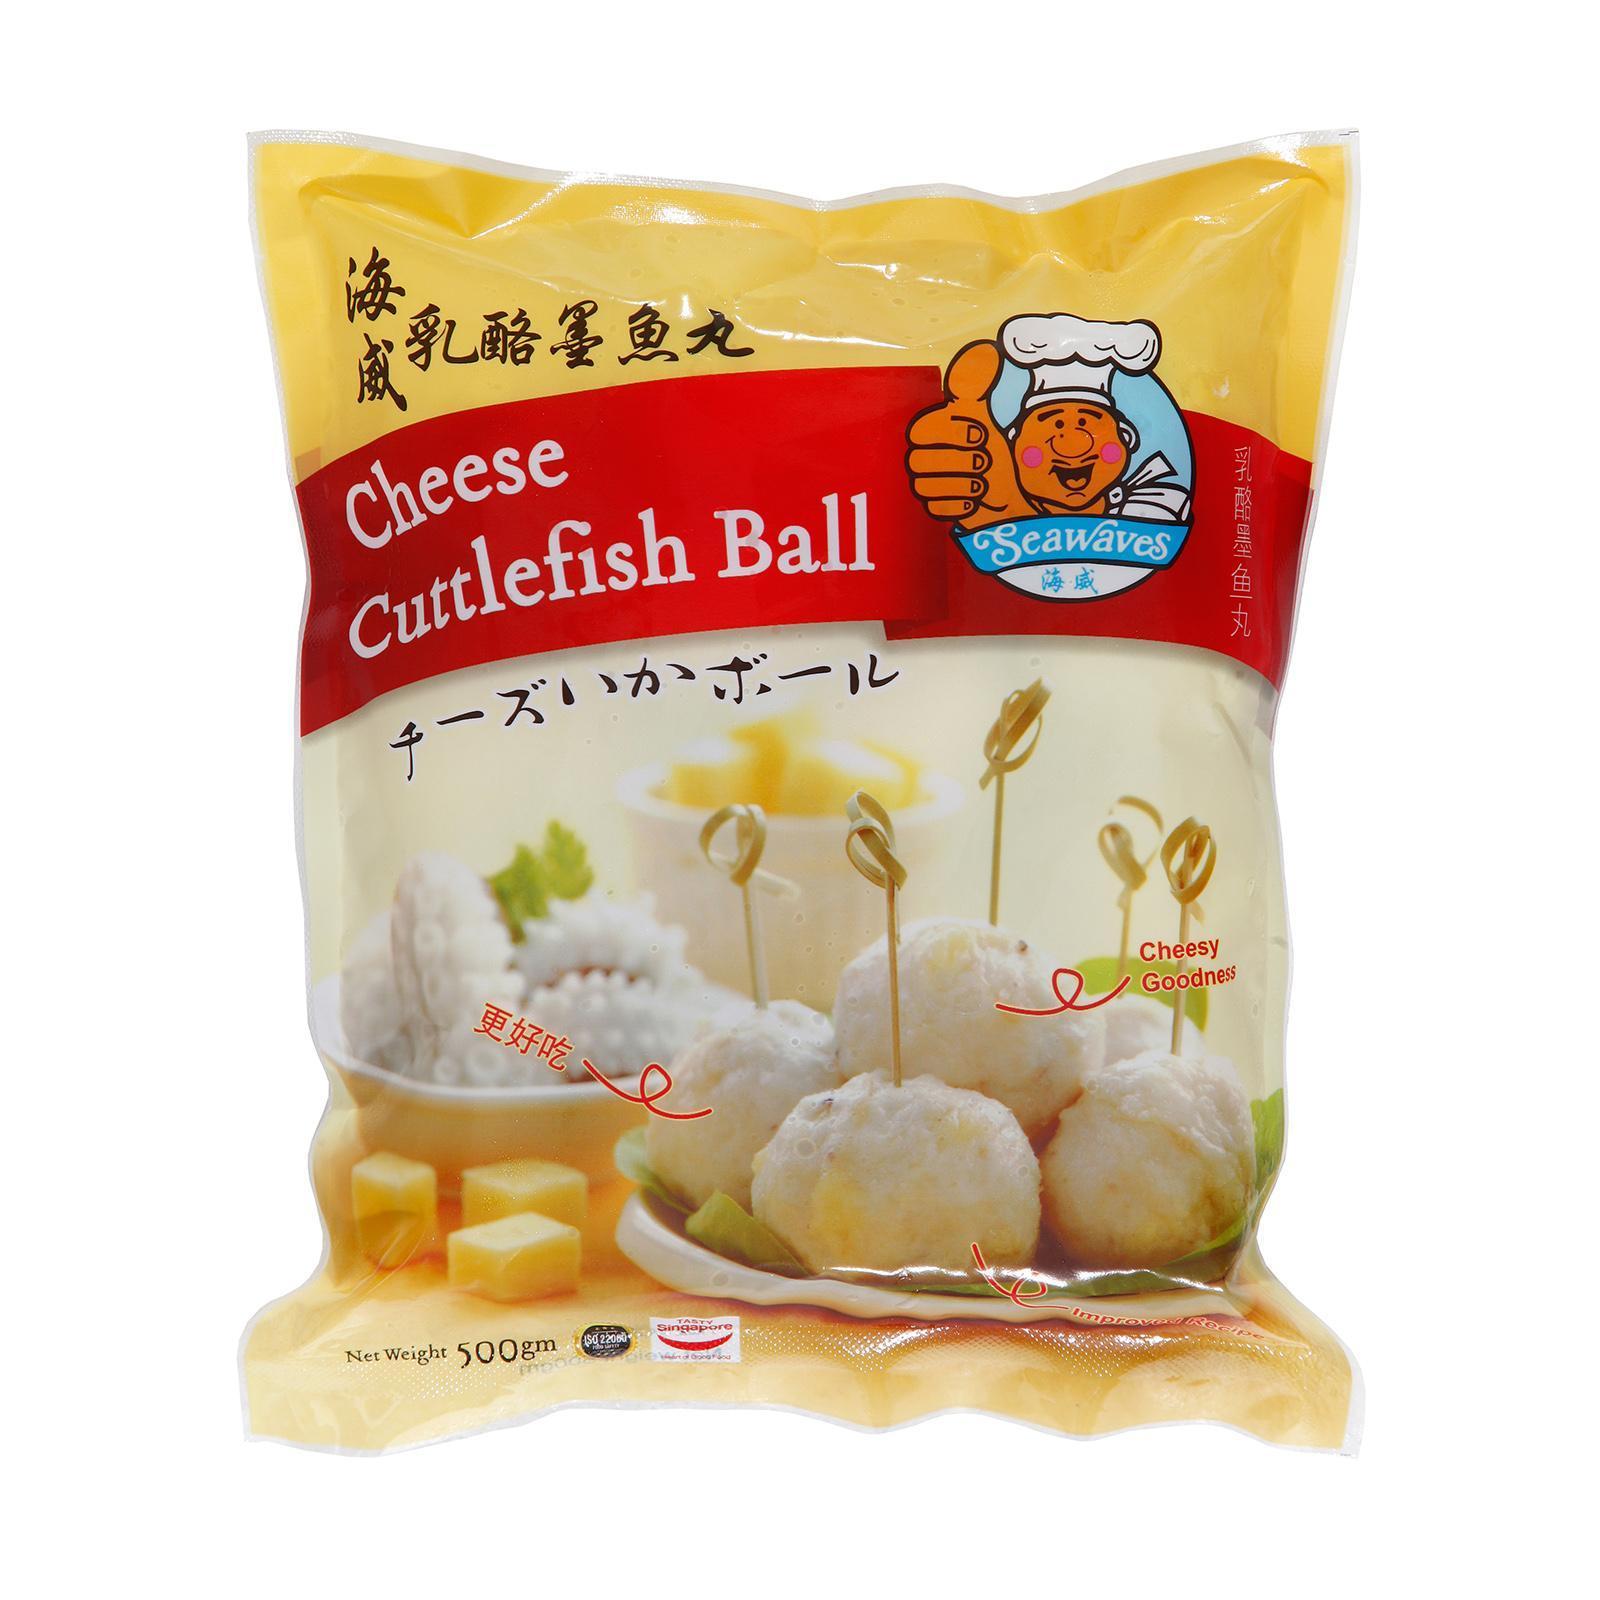 Seawaves Frozen Premium Cuttlefish Ball - Cheese